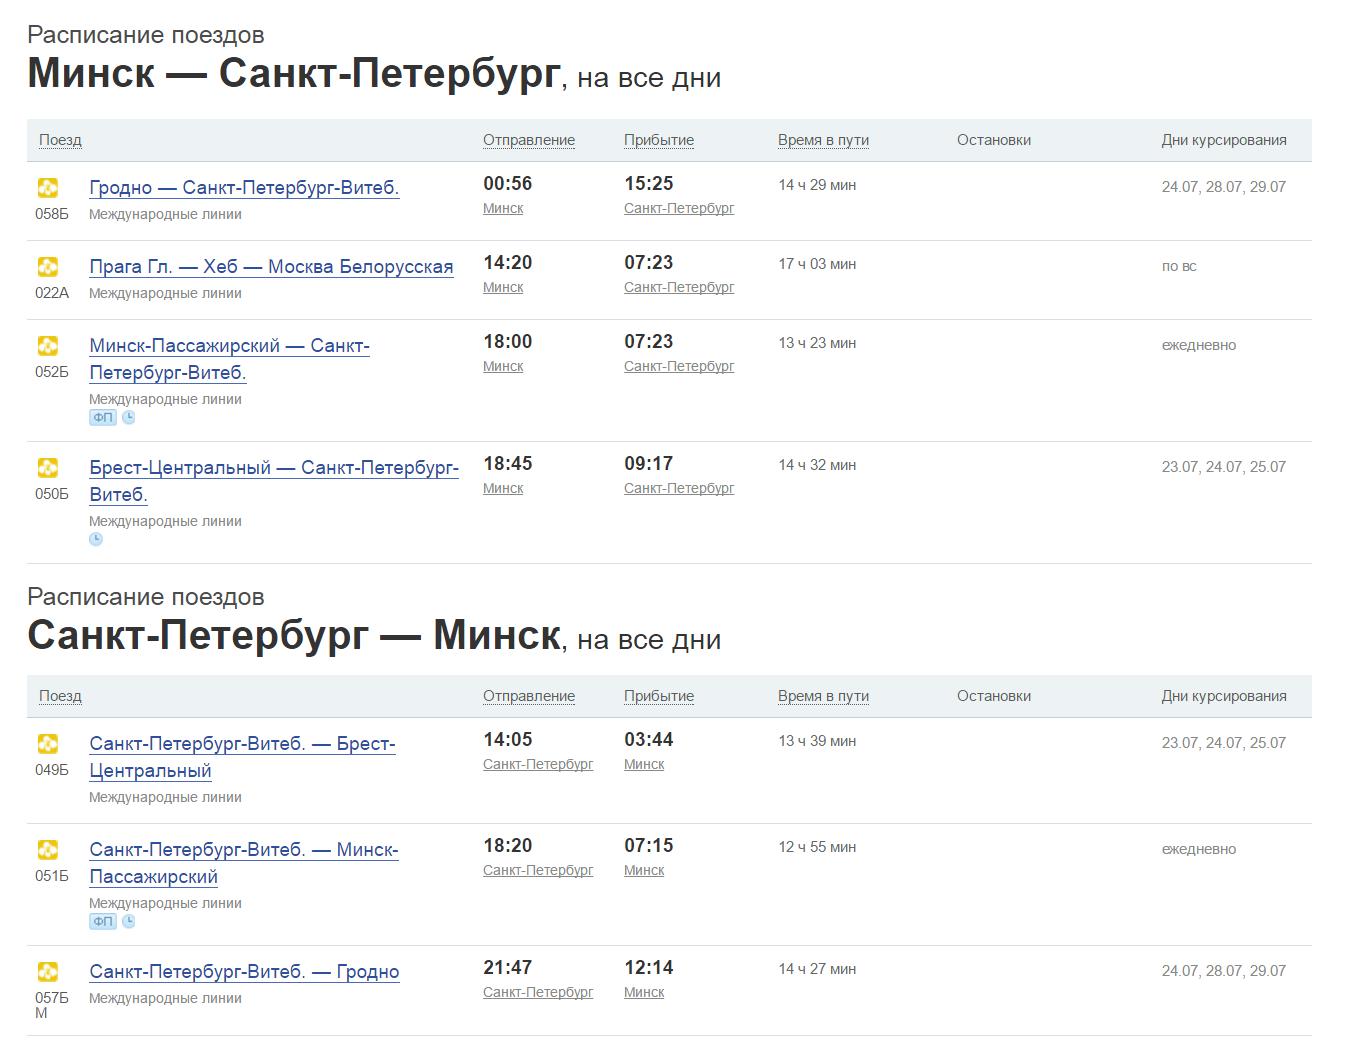 из Минска до Санкт-Петербурга